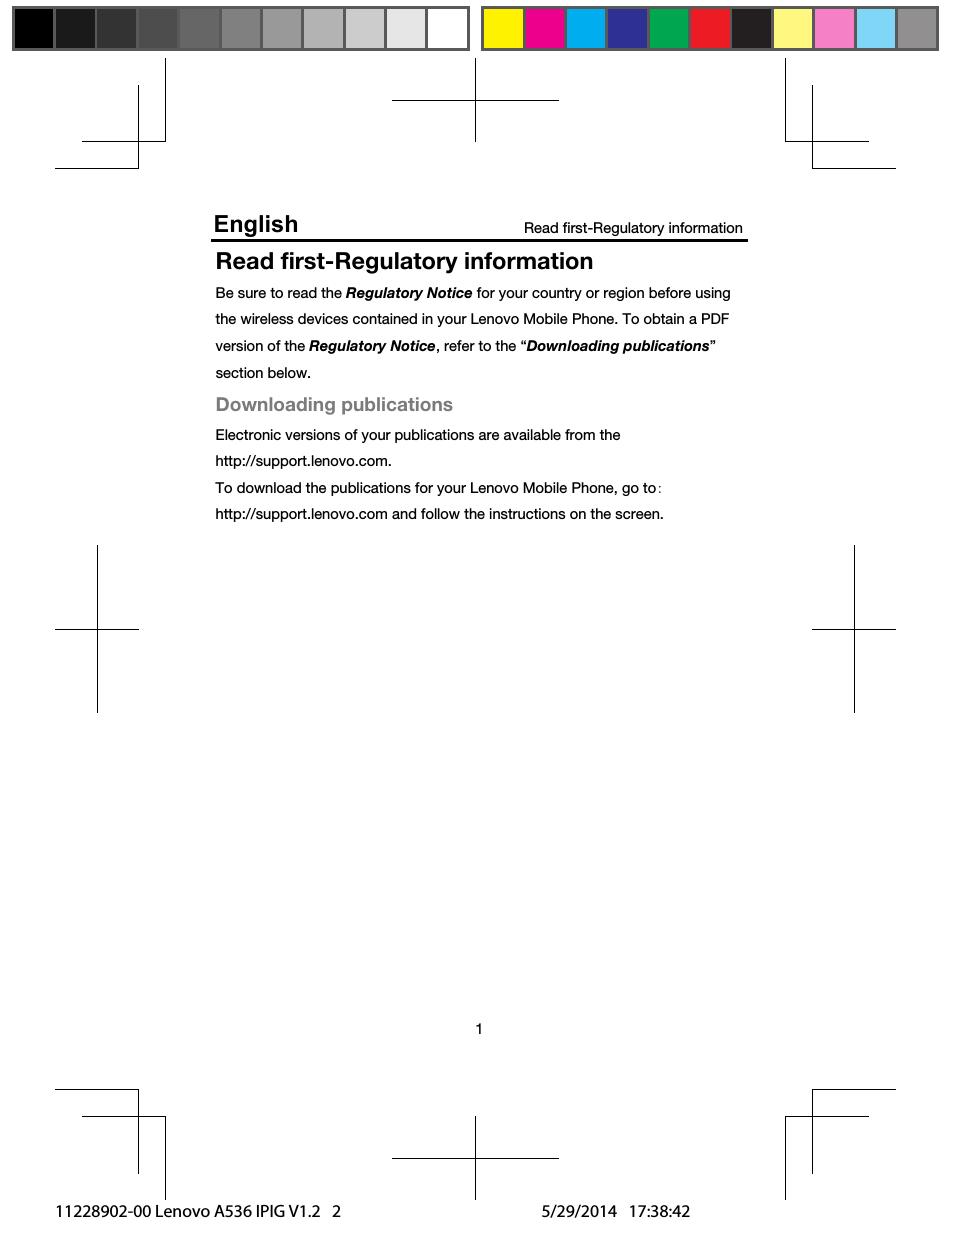 Read first-regulatory information, English